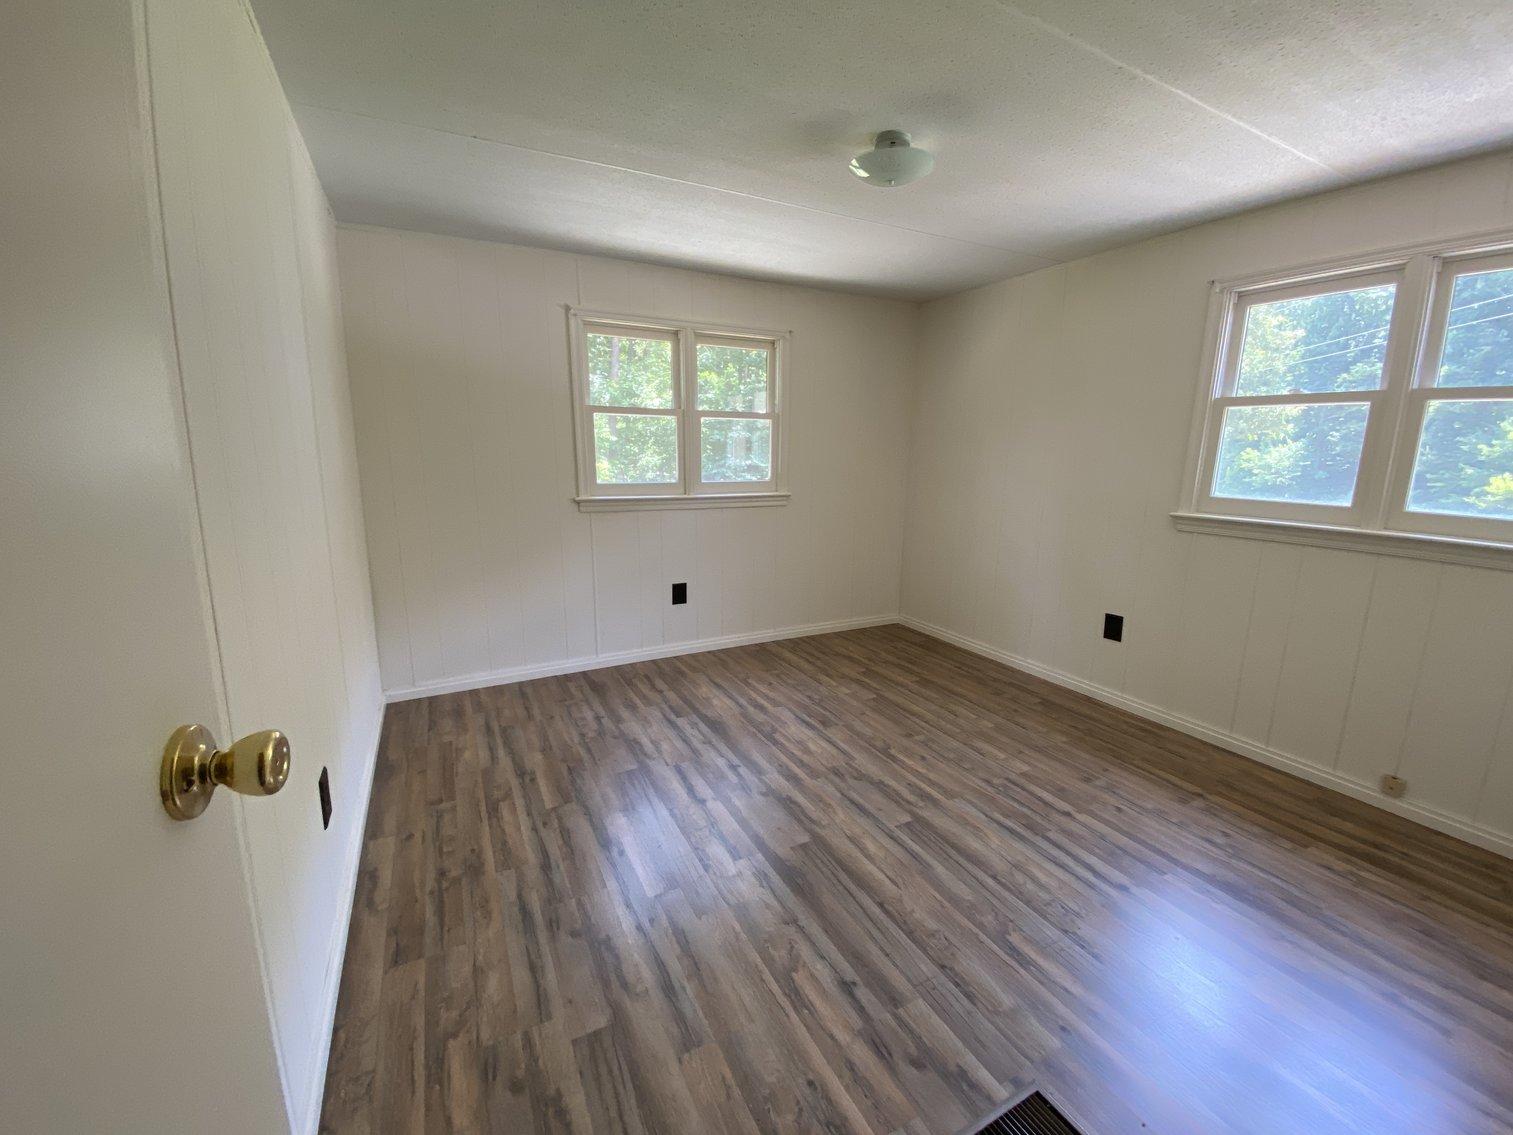 Image for 4 BR/4 BA Home on 29.1 +/- Acres in Orange County, VA--SELLS to the HIGHEST BIDDER!!